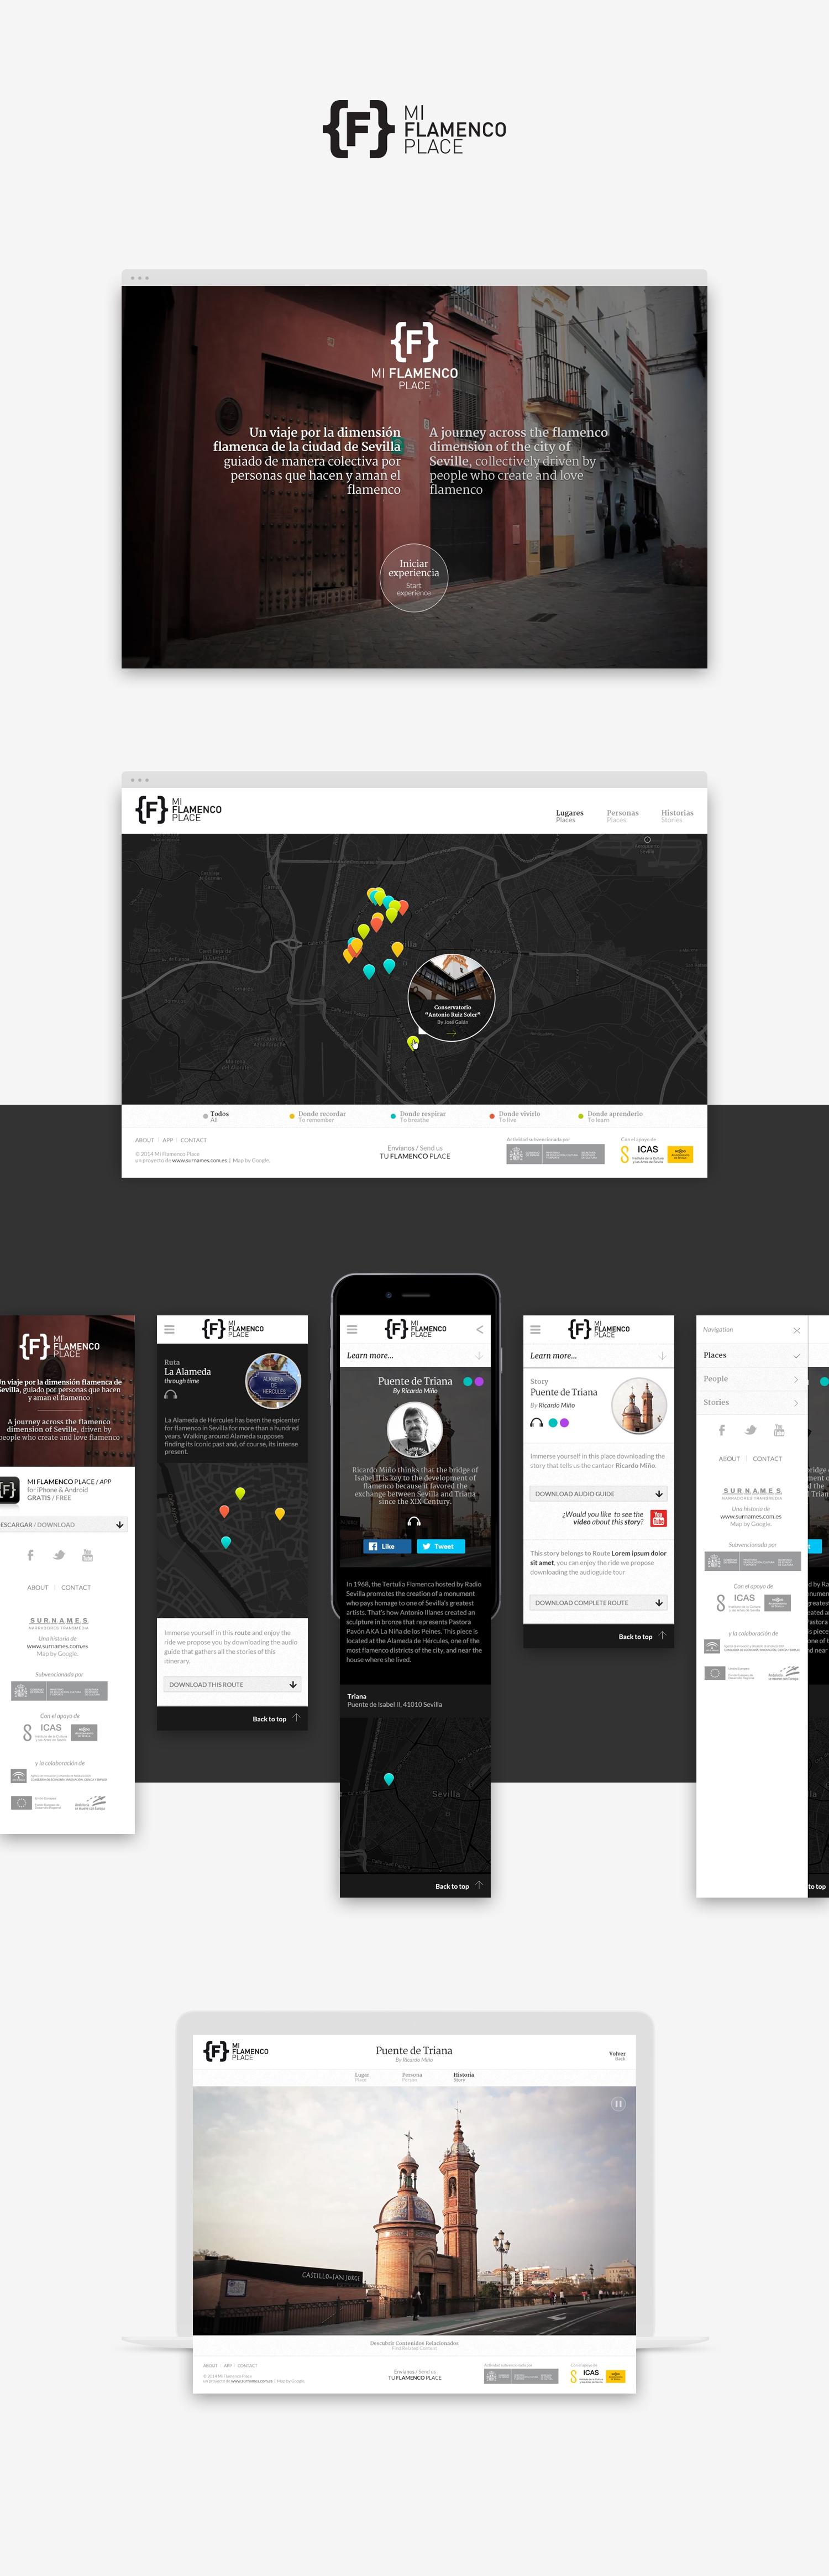 Diseño App Móvil · Mi Flamencoplace · Samuel Matito · diseñador freelance